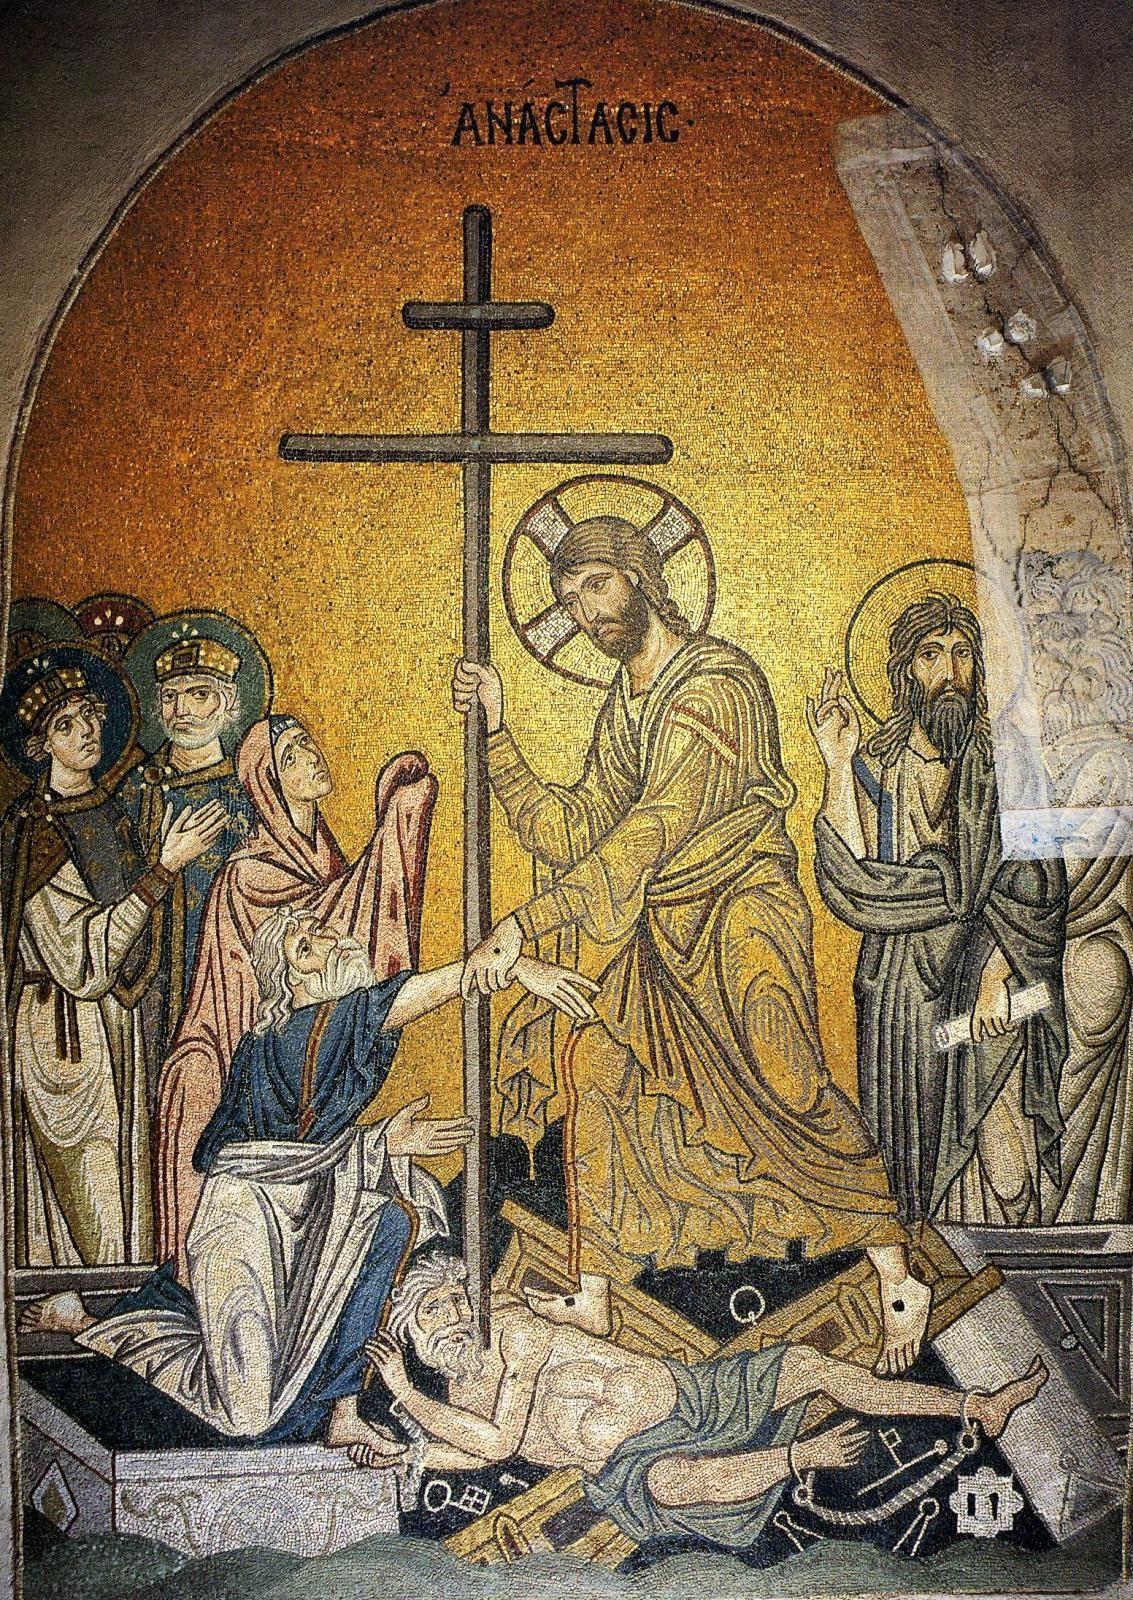 Книжная миниатюра. Евангелие. Византия. XI век. Греция. Афон. Дионисиат